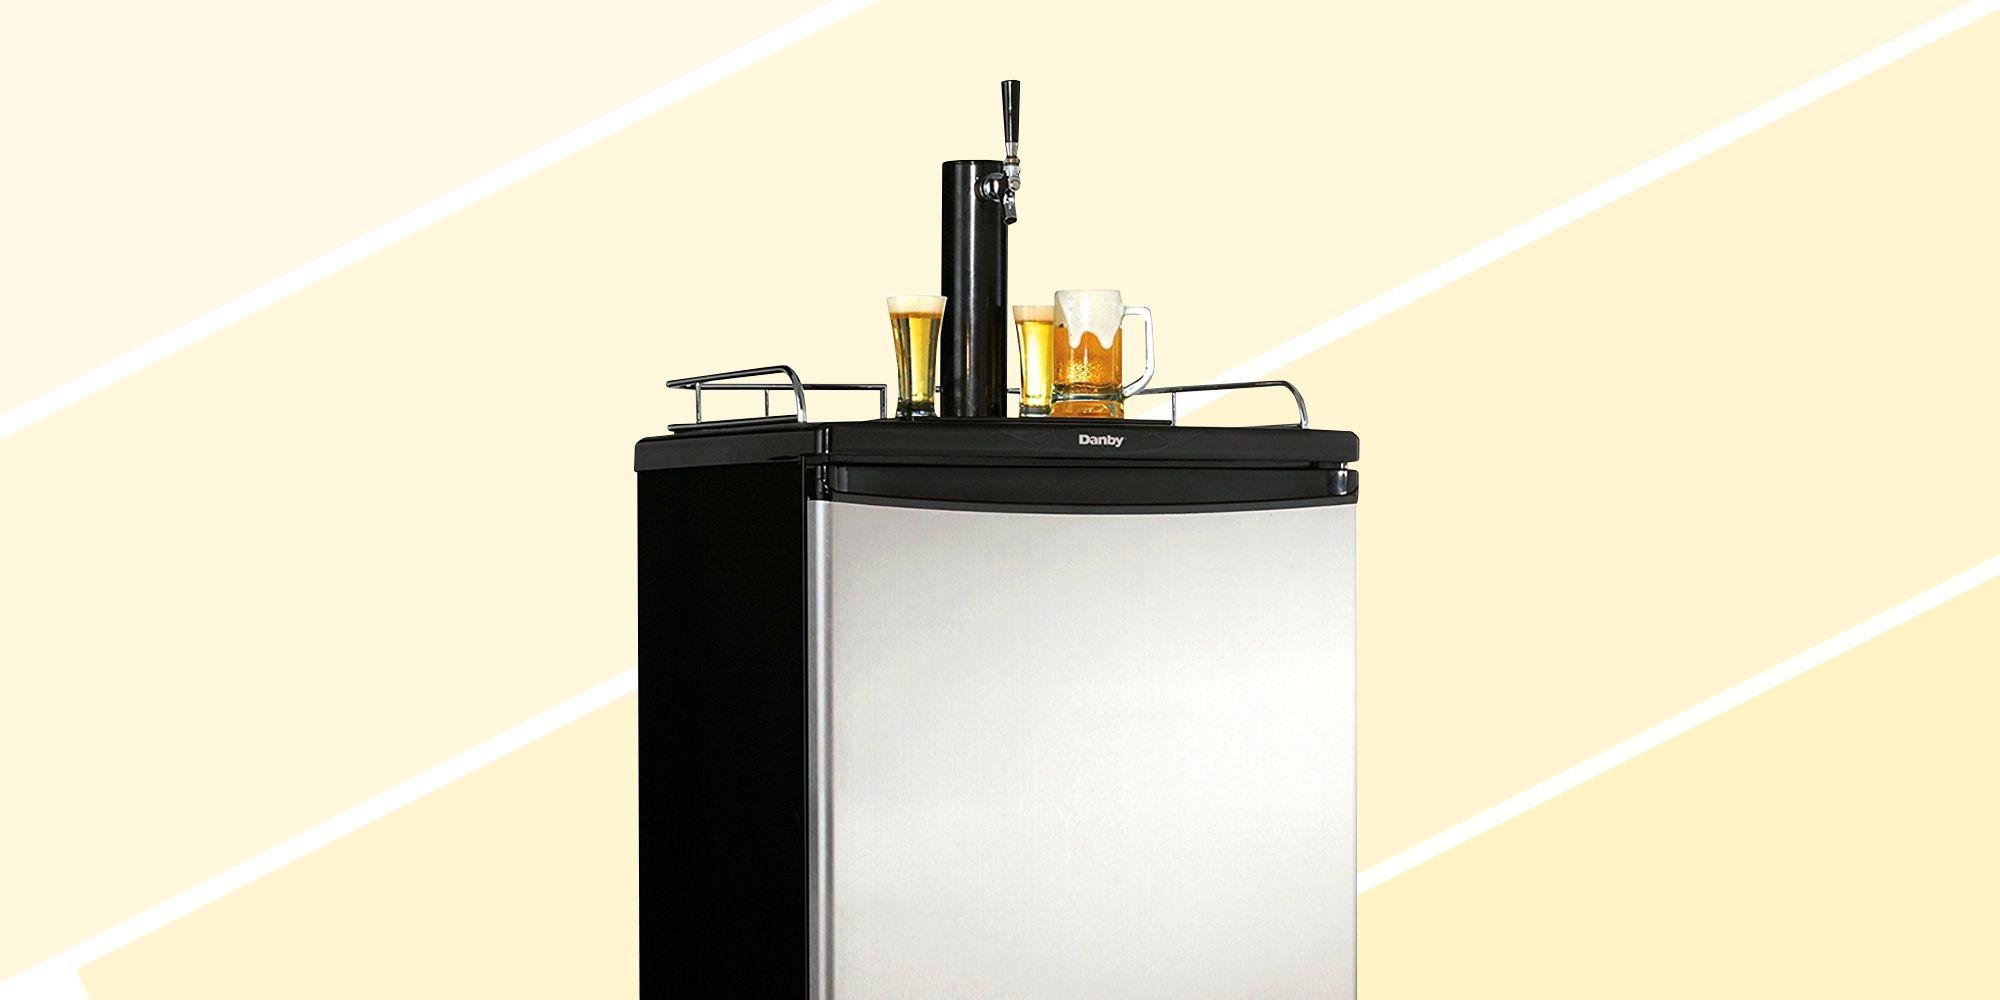 8 Best Kegerators for 2018 - Top Beer Dispensers and Beverage ...